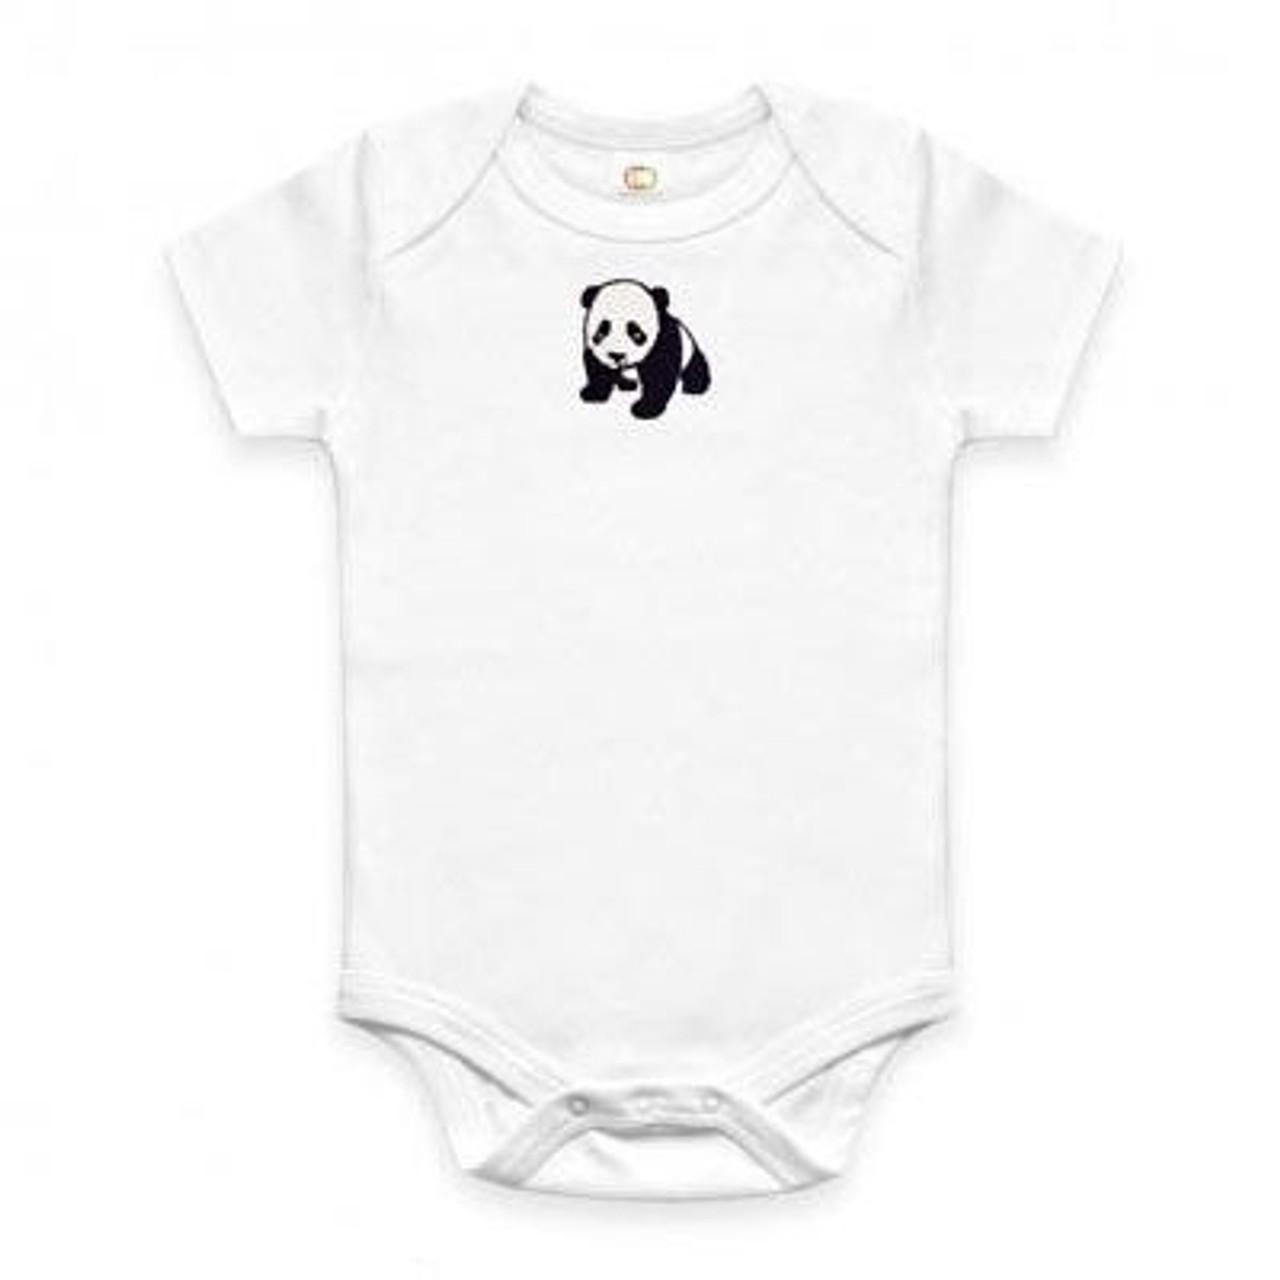 Organic Panda Onesie - 6-12 Months